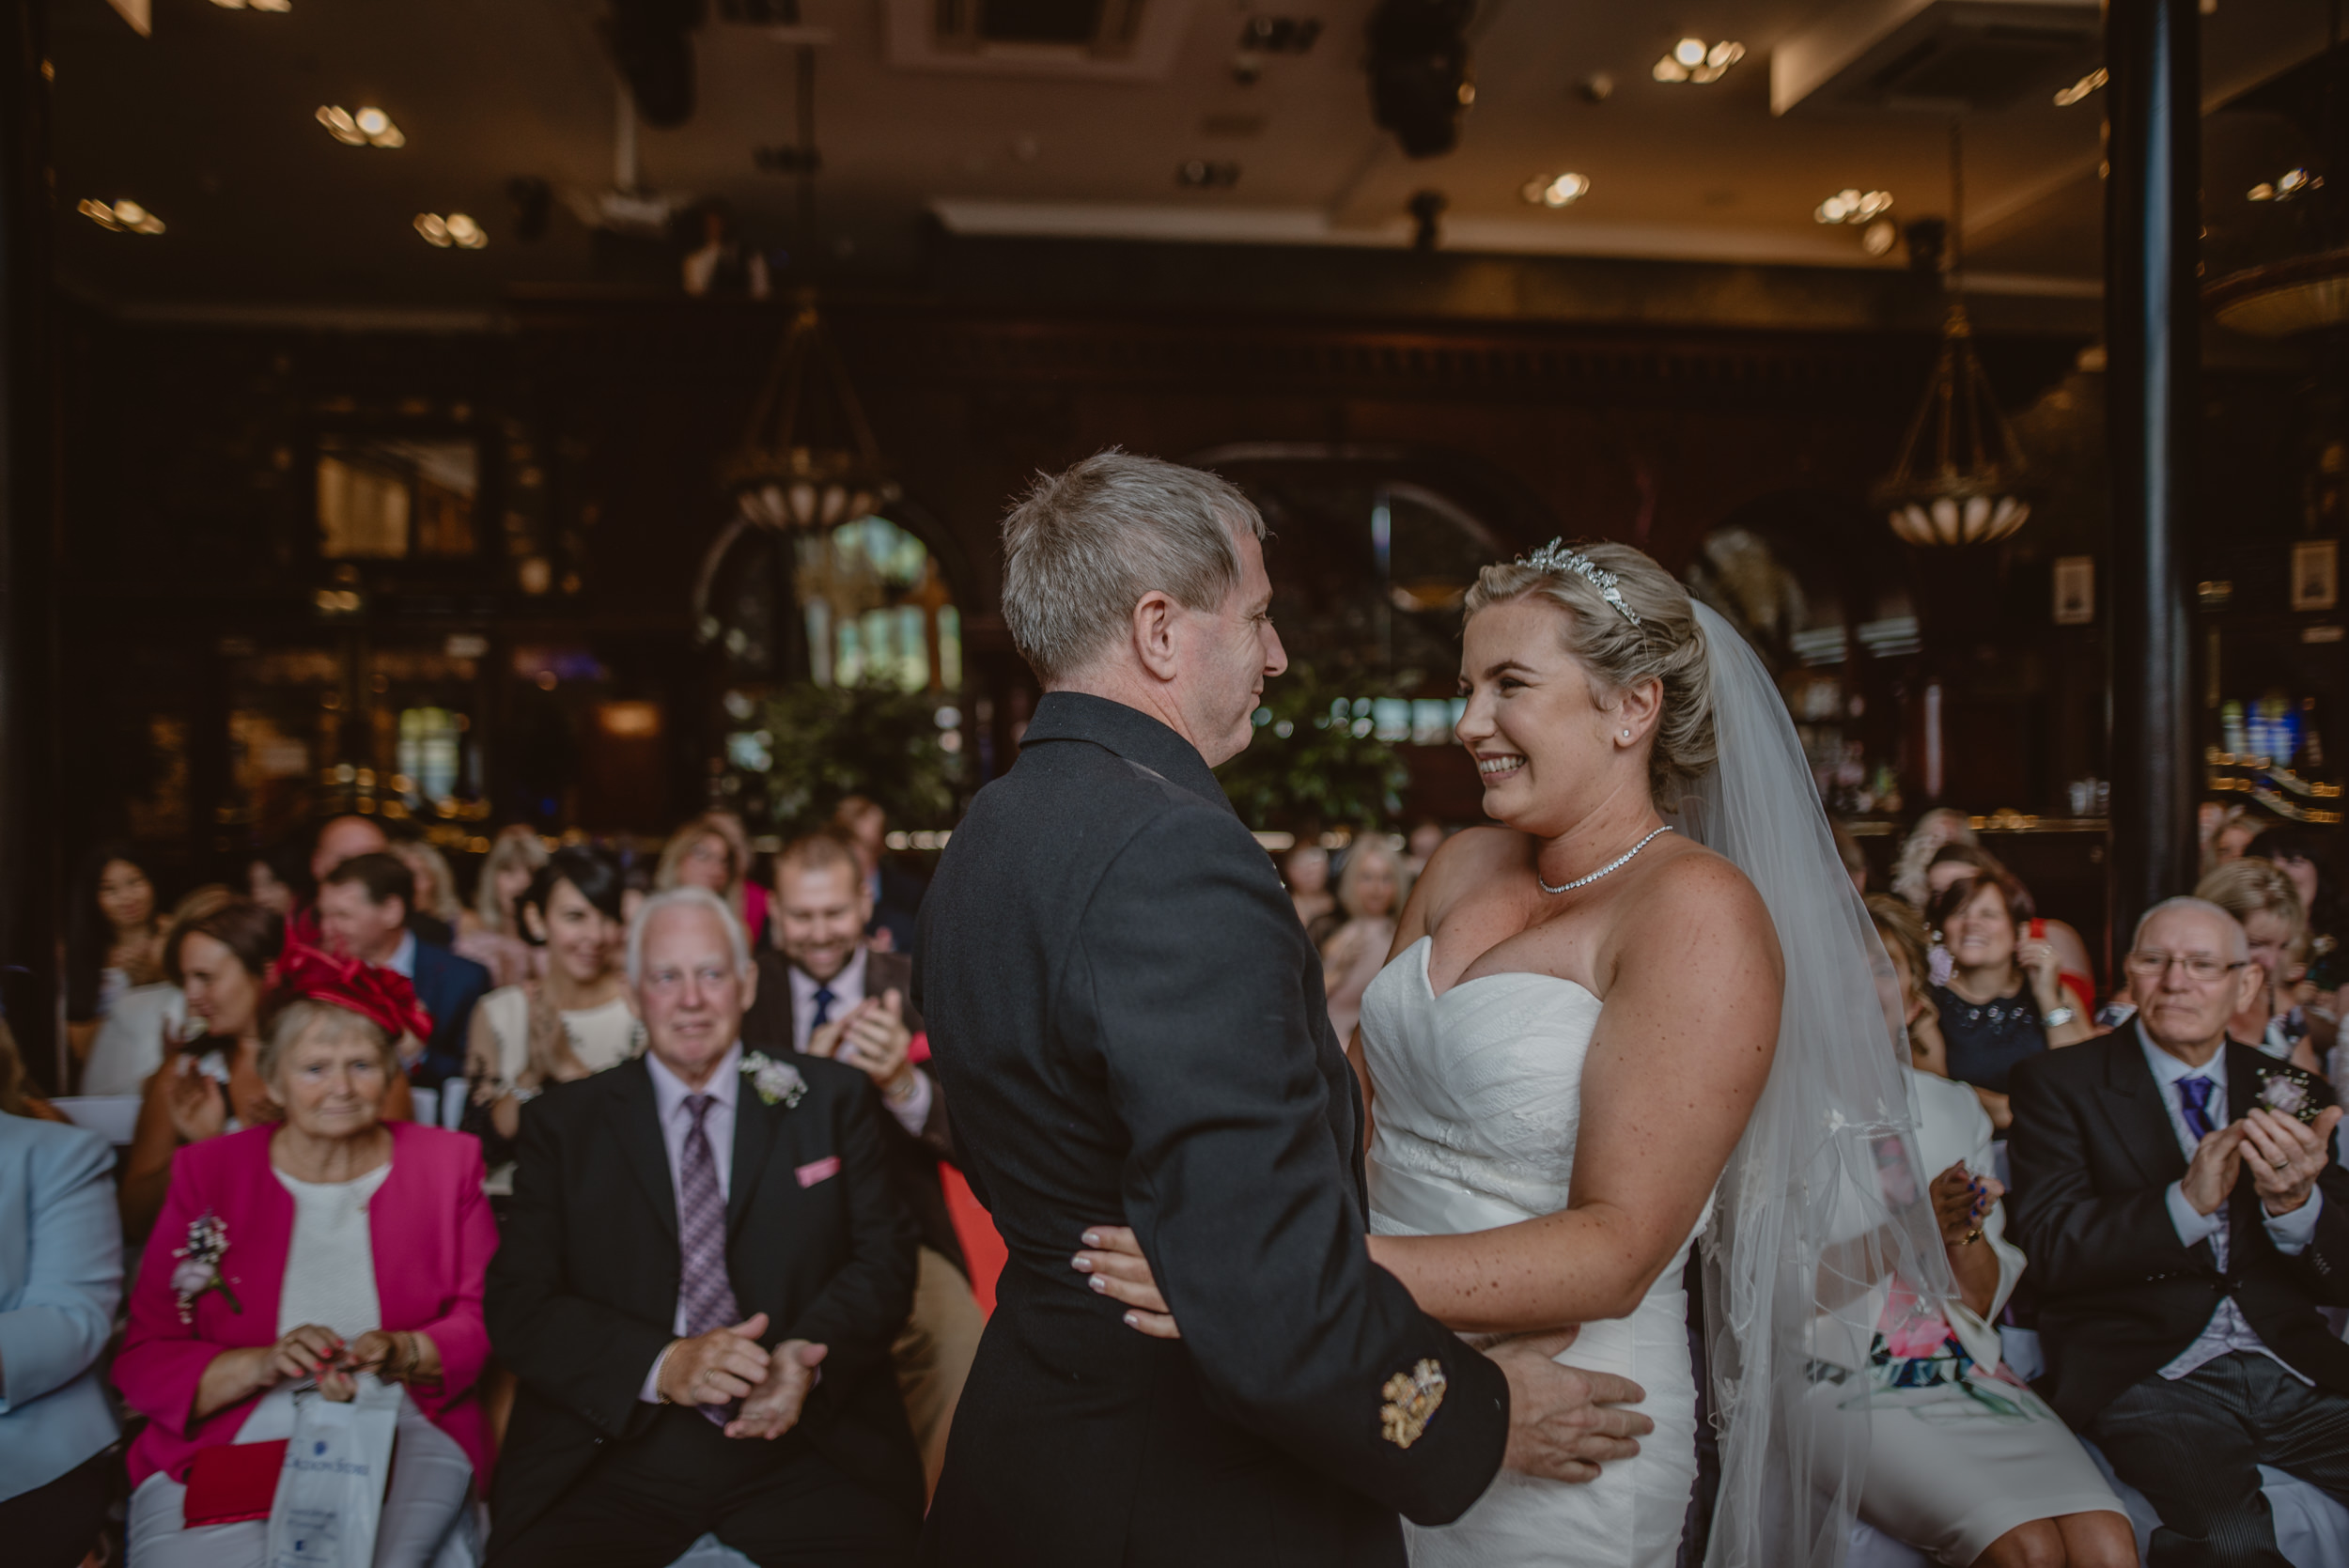 Chantelle-and-Stephen-Old-Thorns-Hotel-Wedding-Liphook-Manu-Mendoza-Wedding-Photography-234.jpg